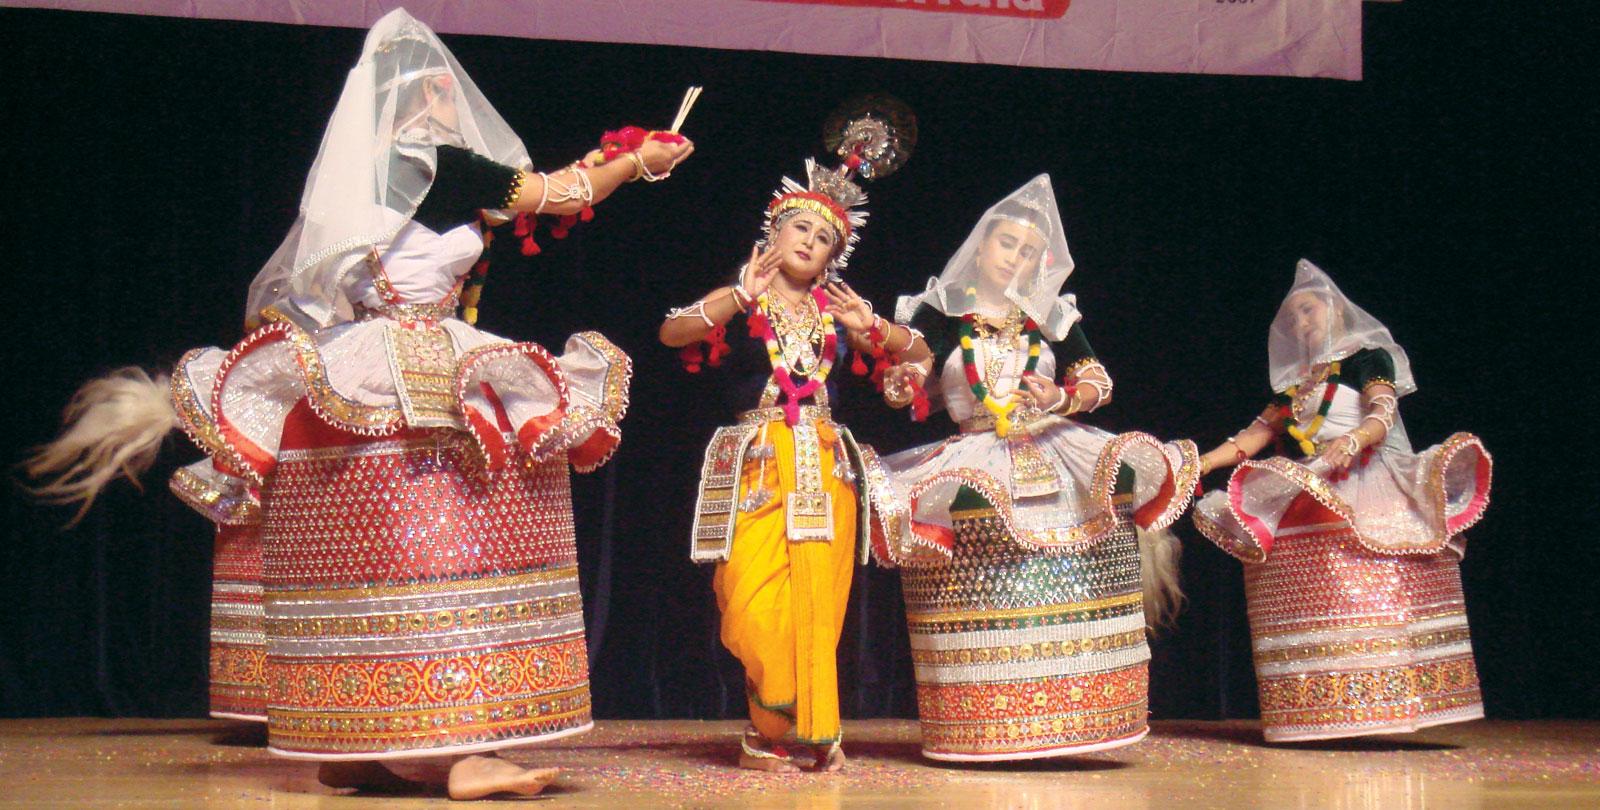 manipuri | History, Characteristics, & Facts | Britannica